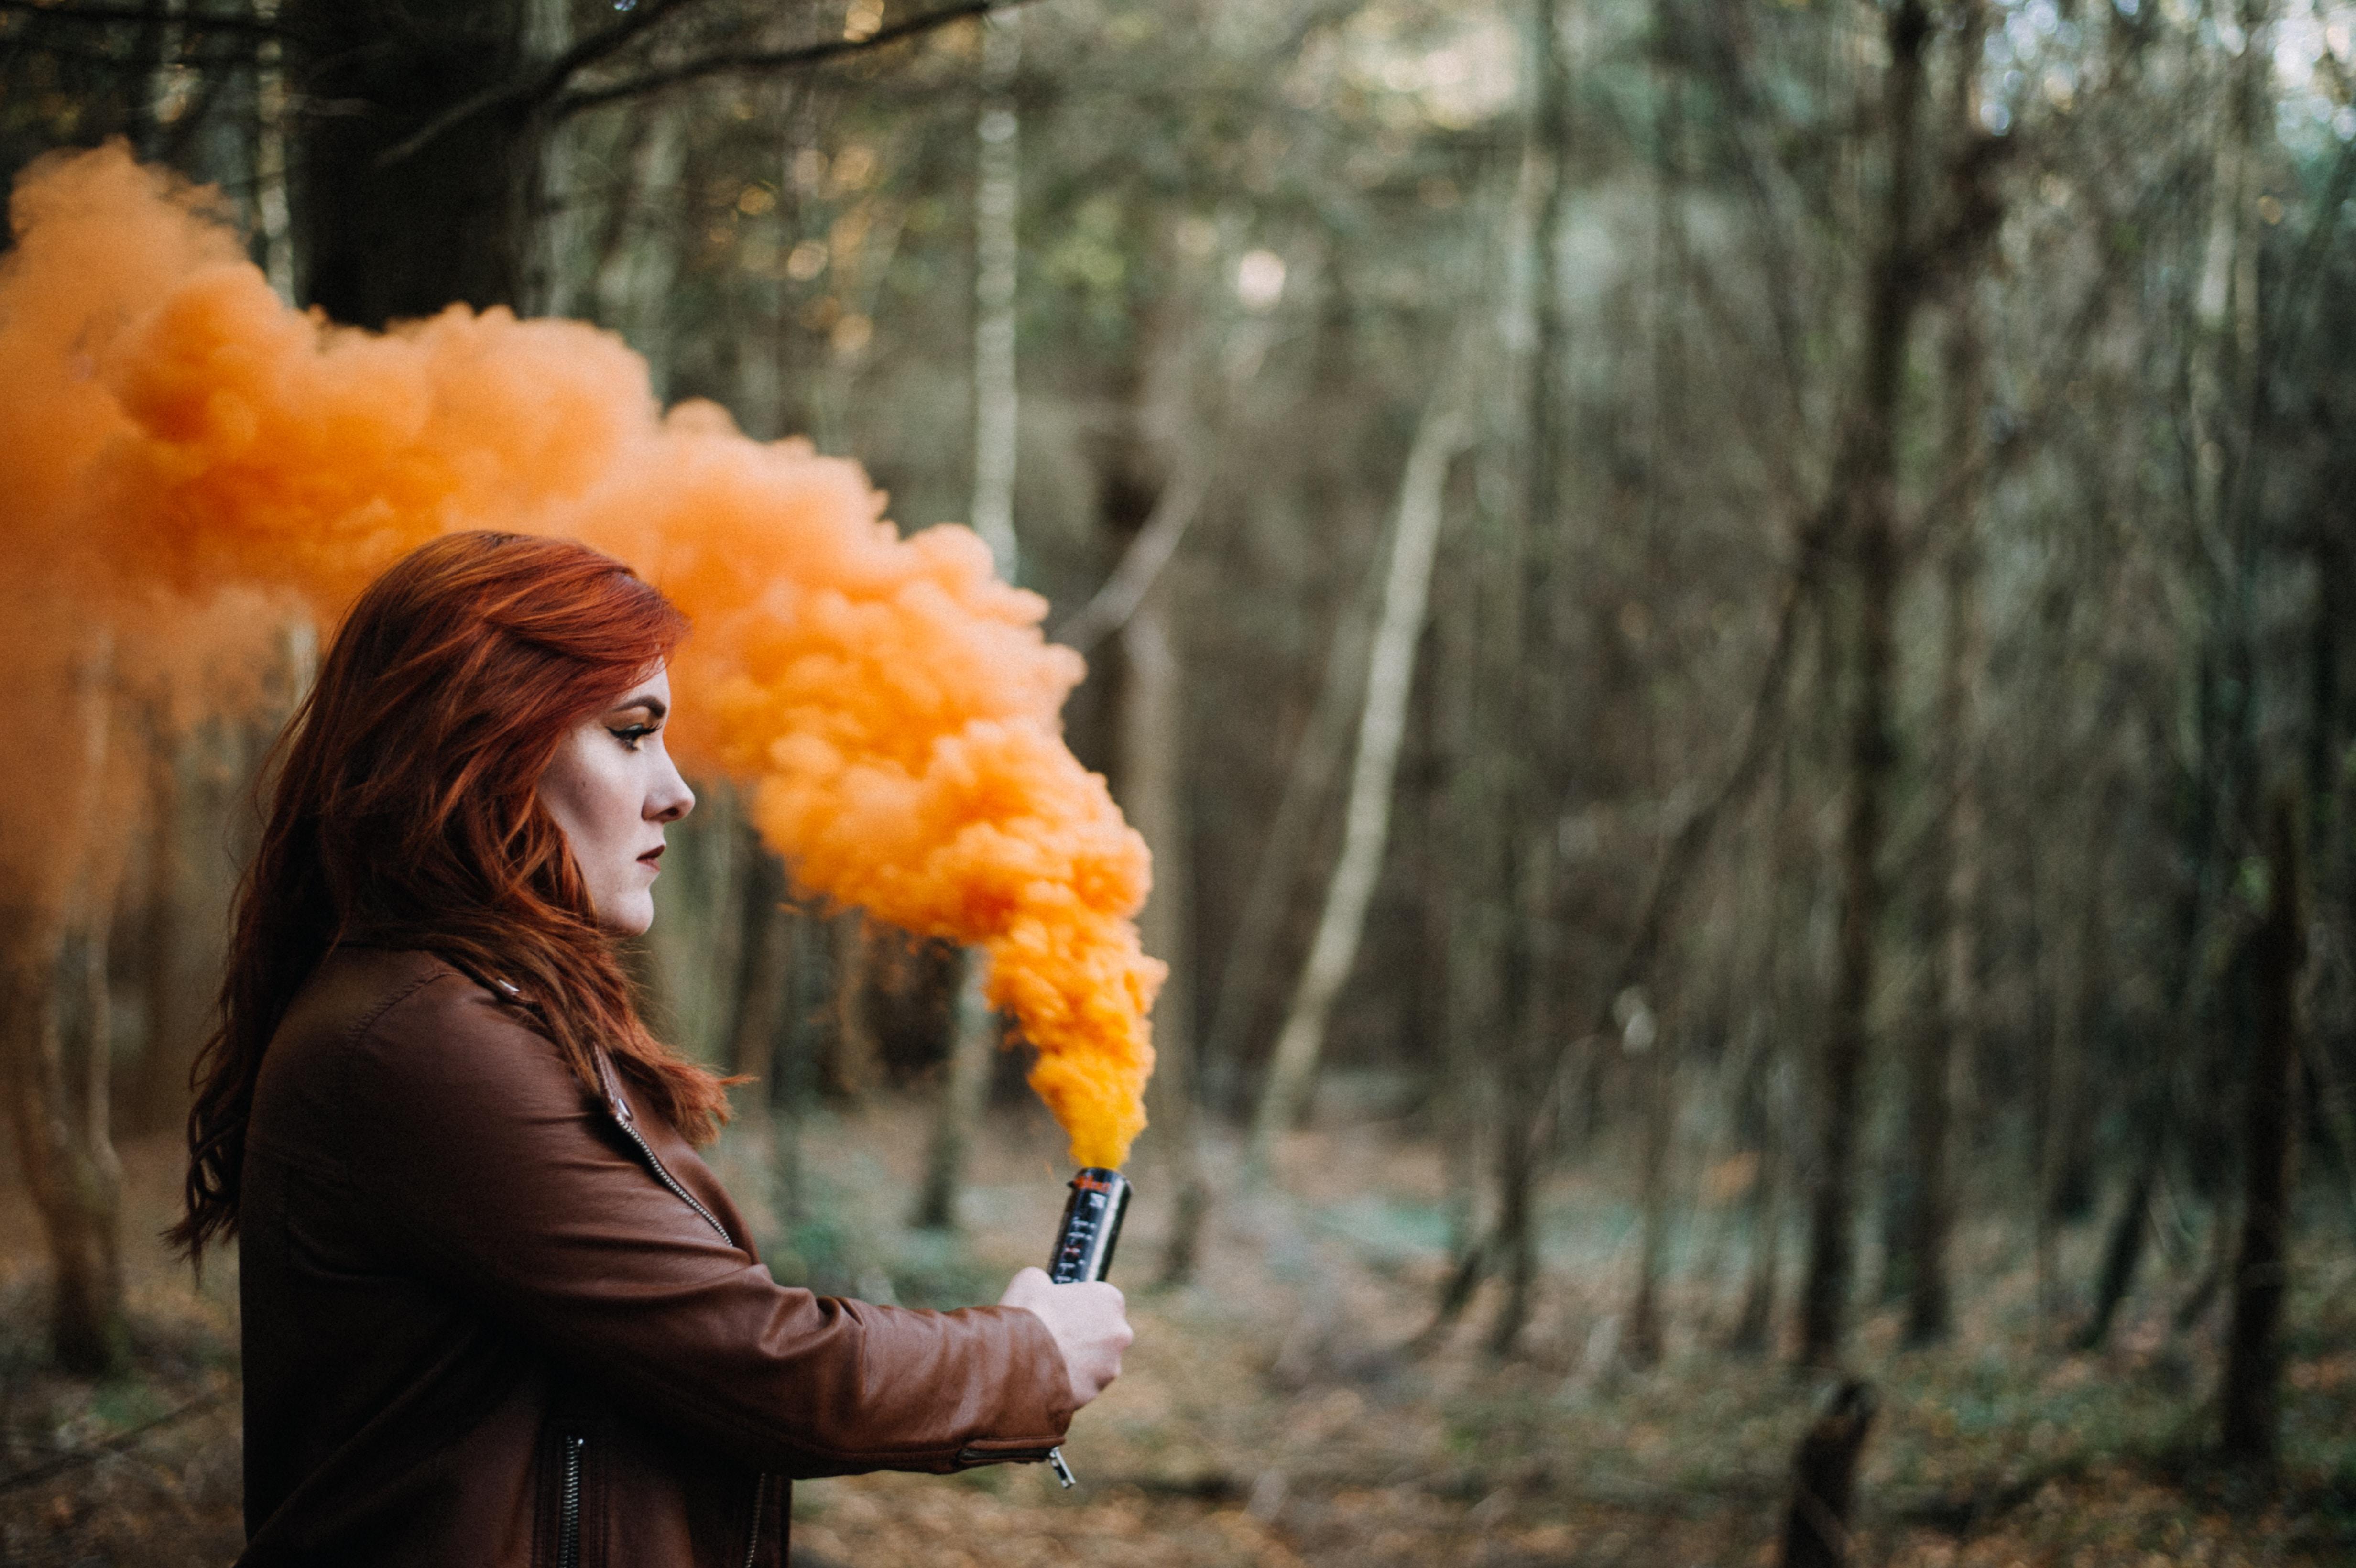 woman holding orange smoke powder surrounded with trees during daytime